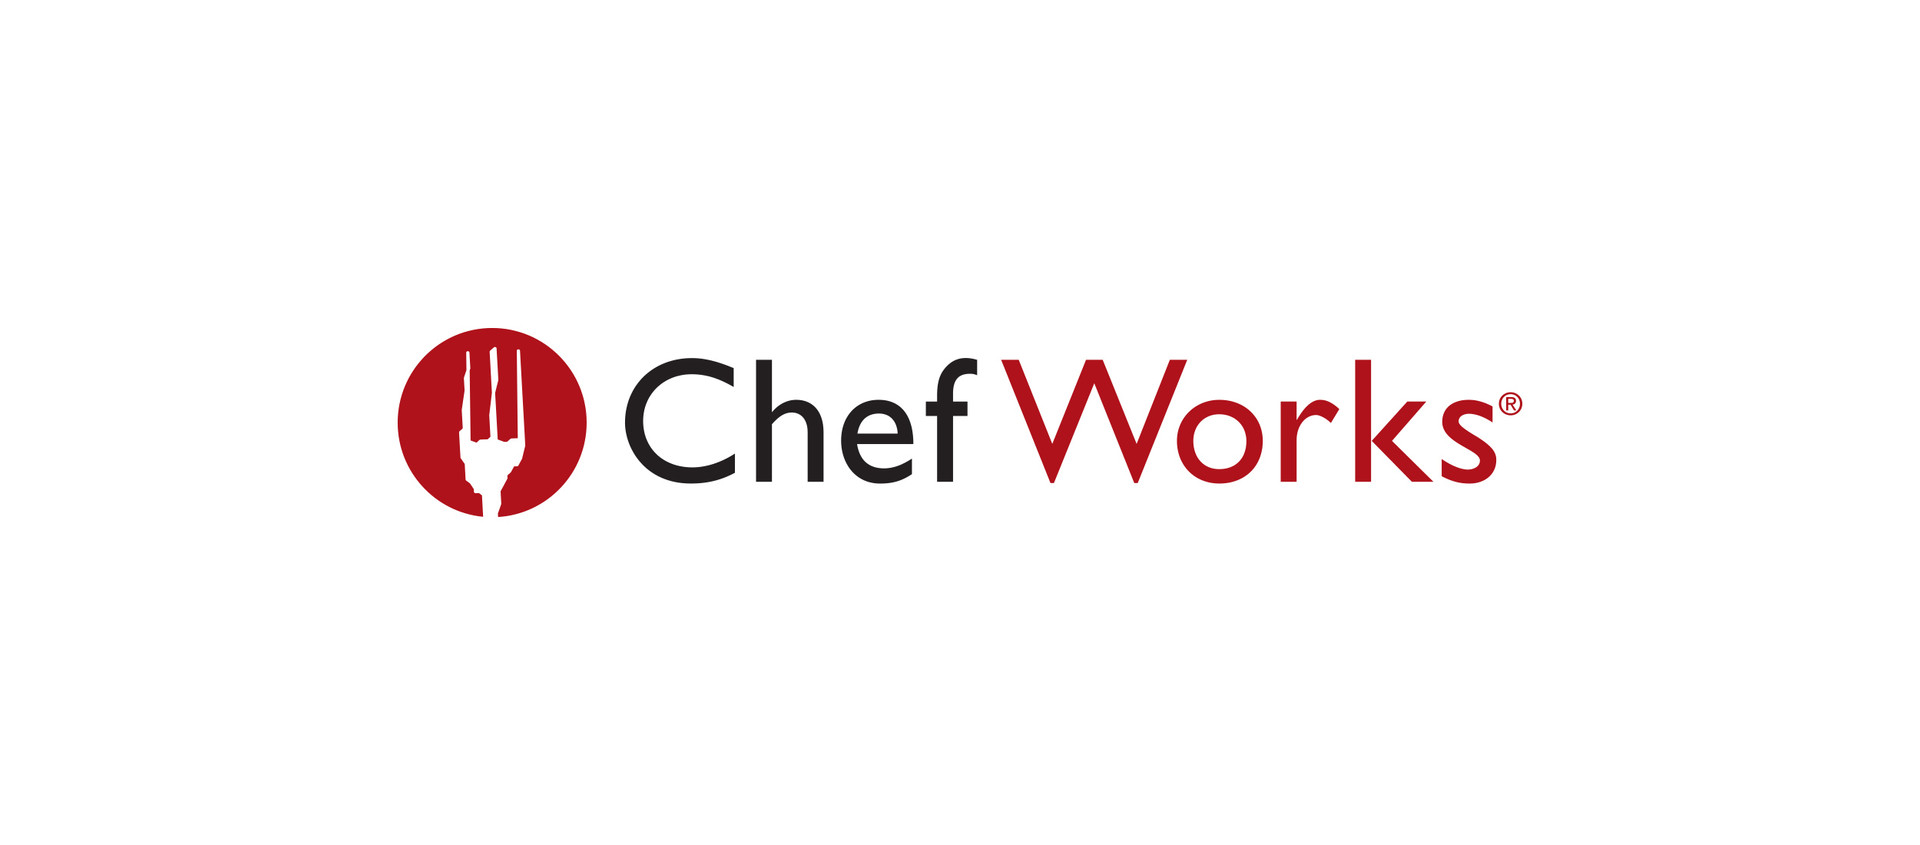 chefworks_01.jpg